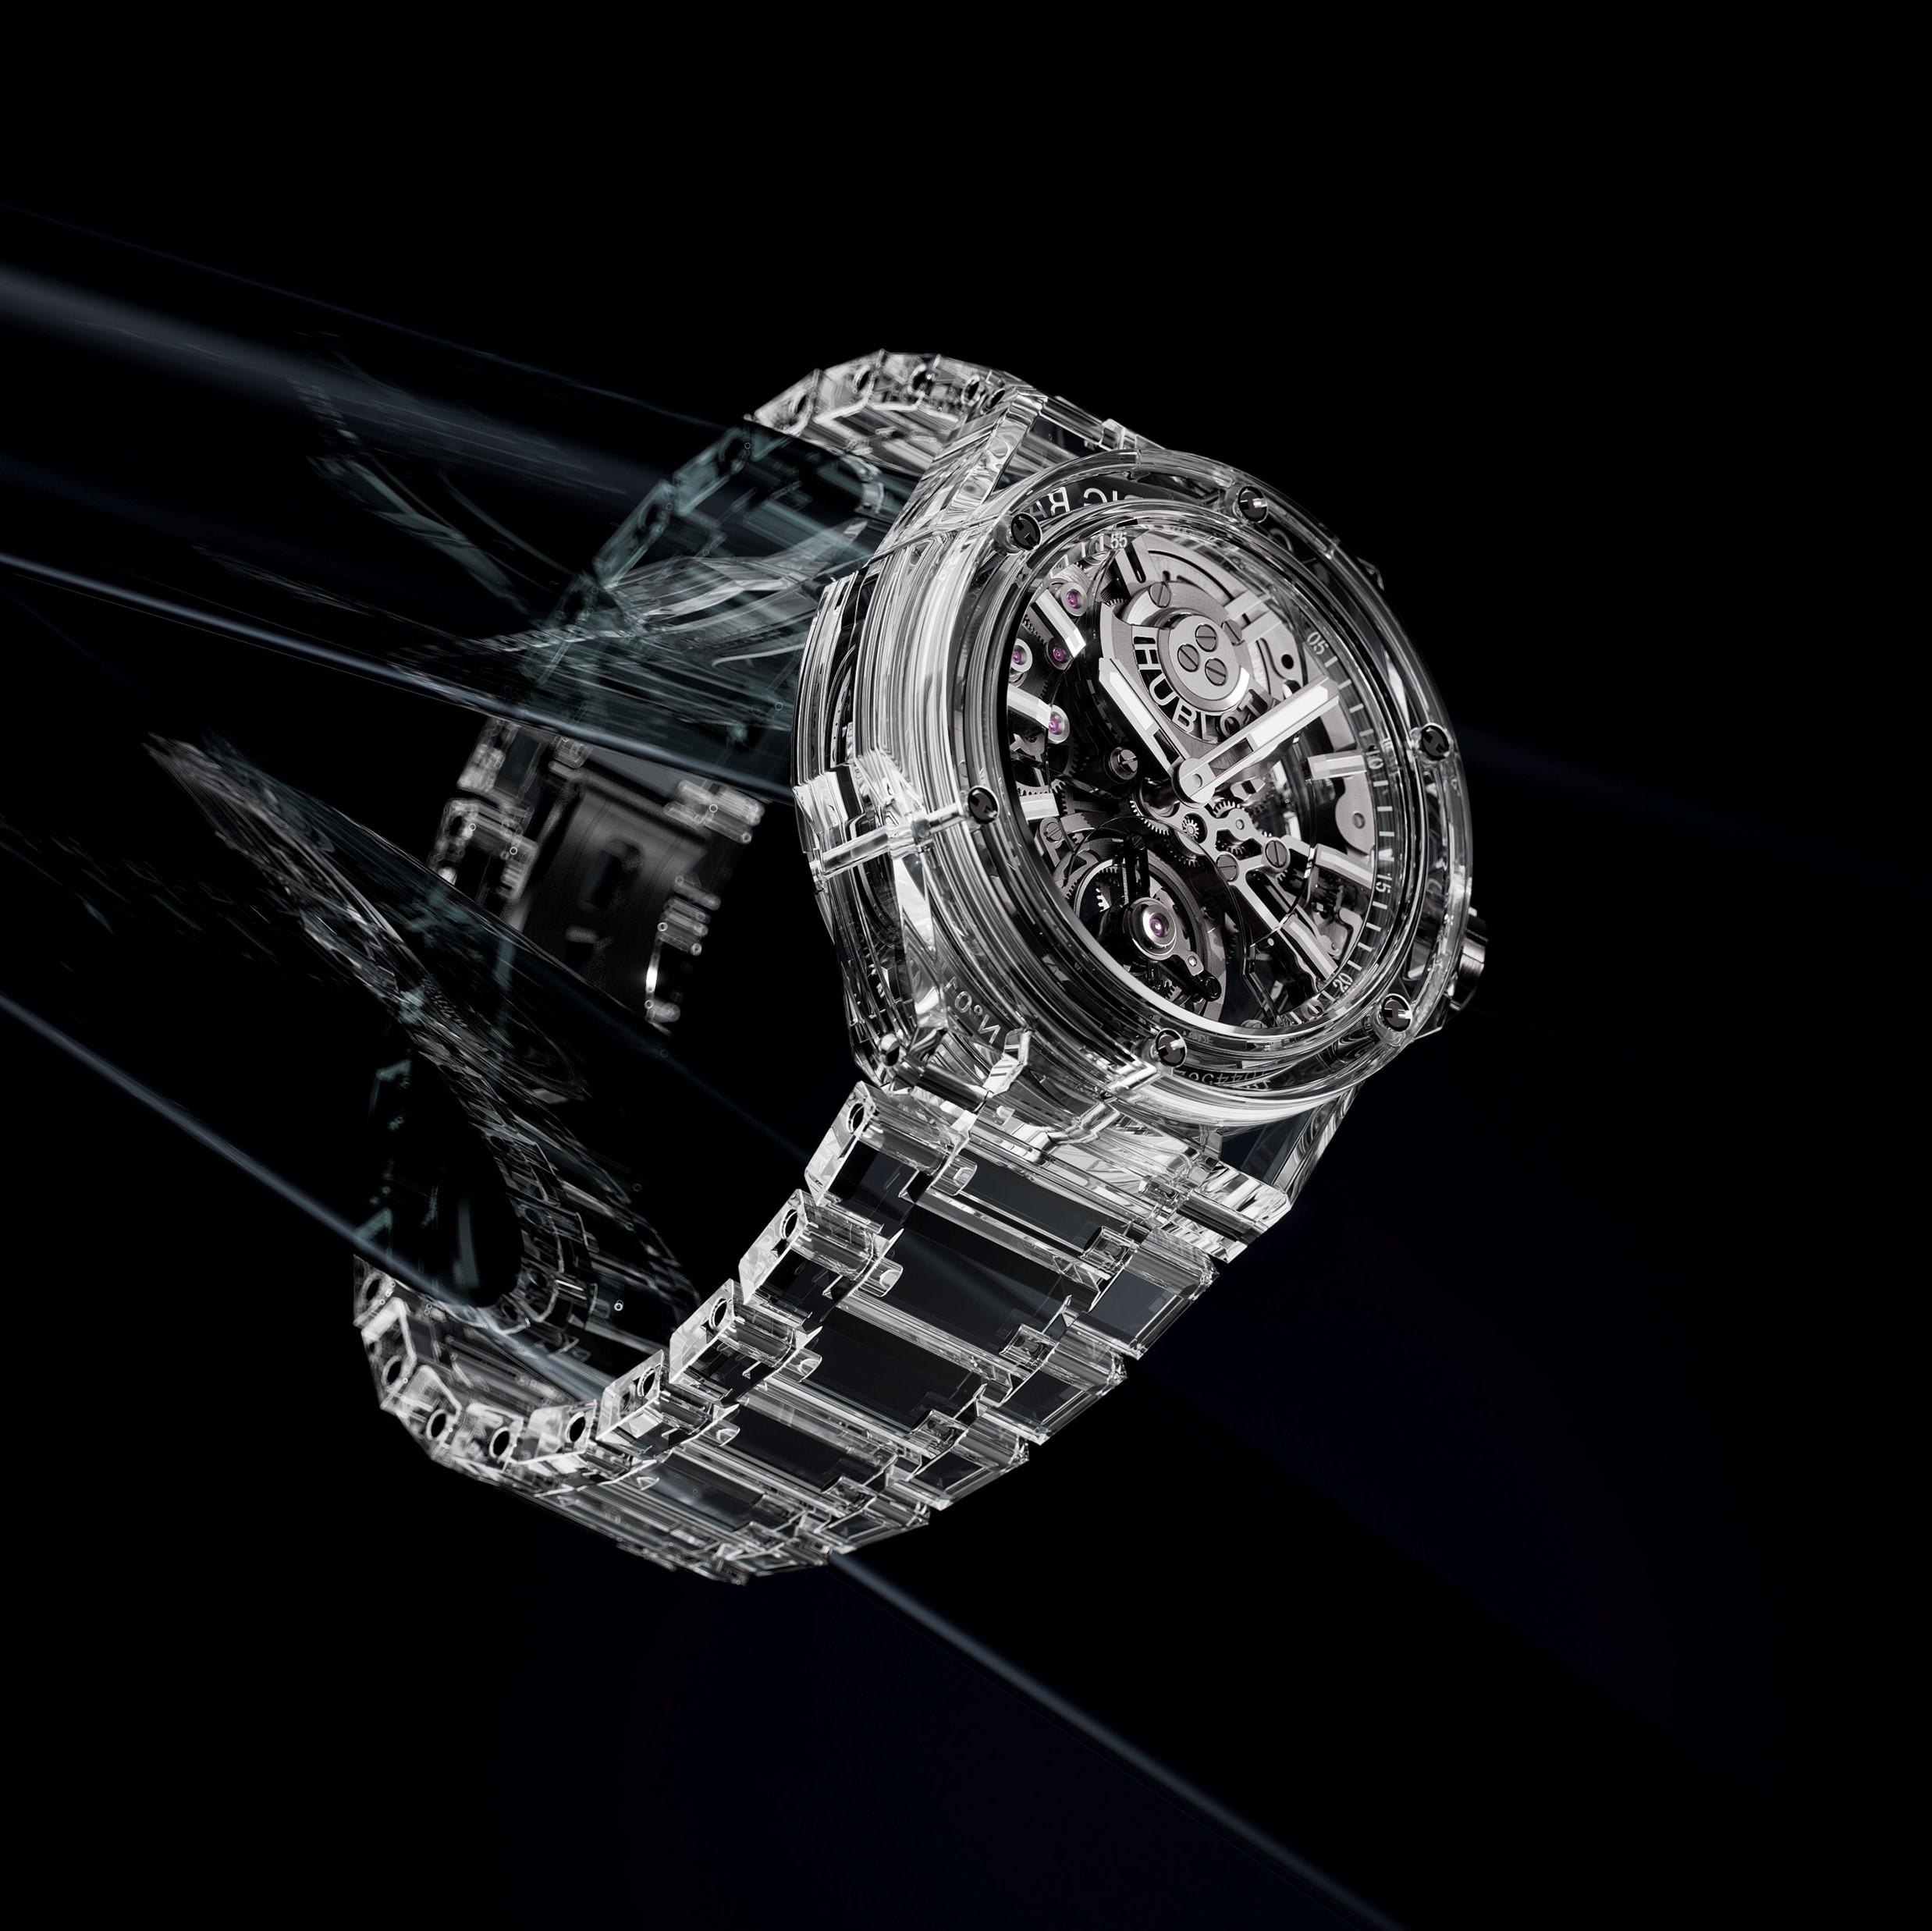 Hublot Big Bang Integral Tourbillon Full Sapphire